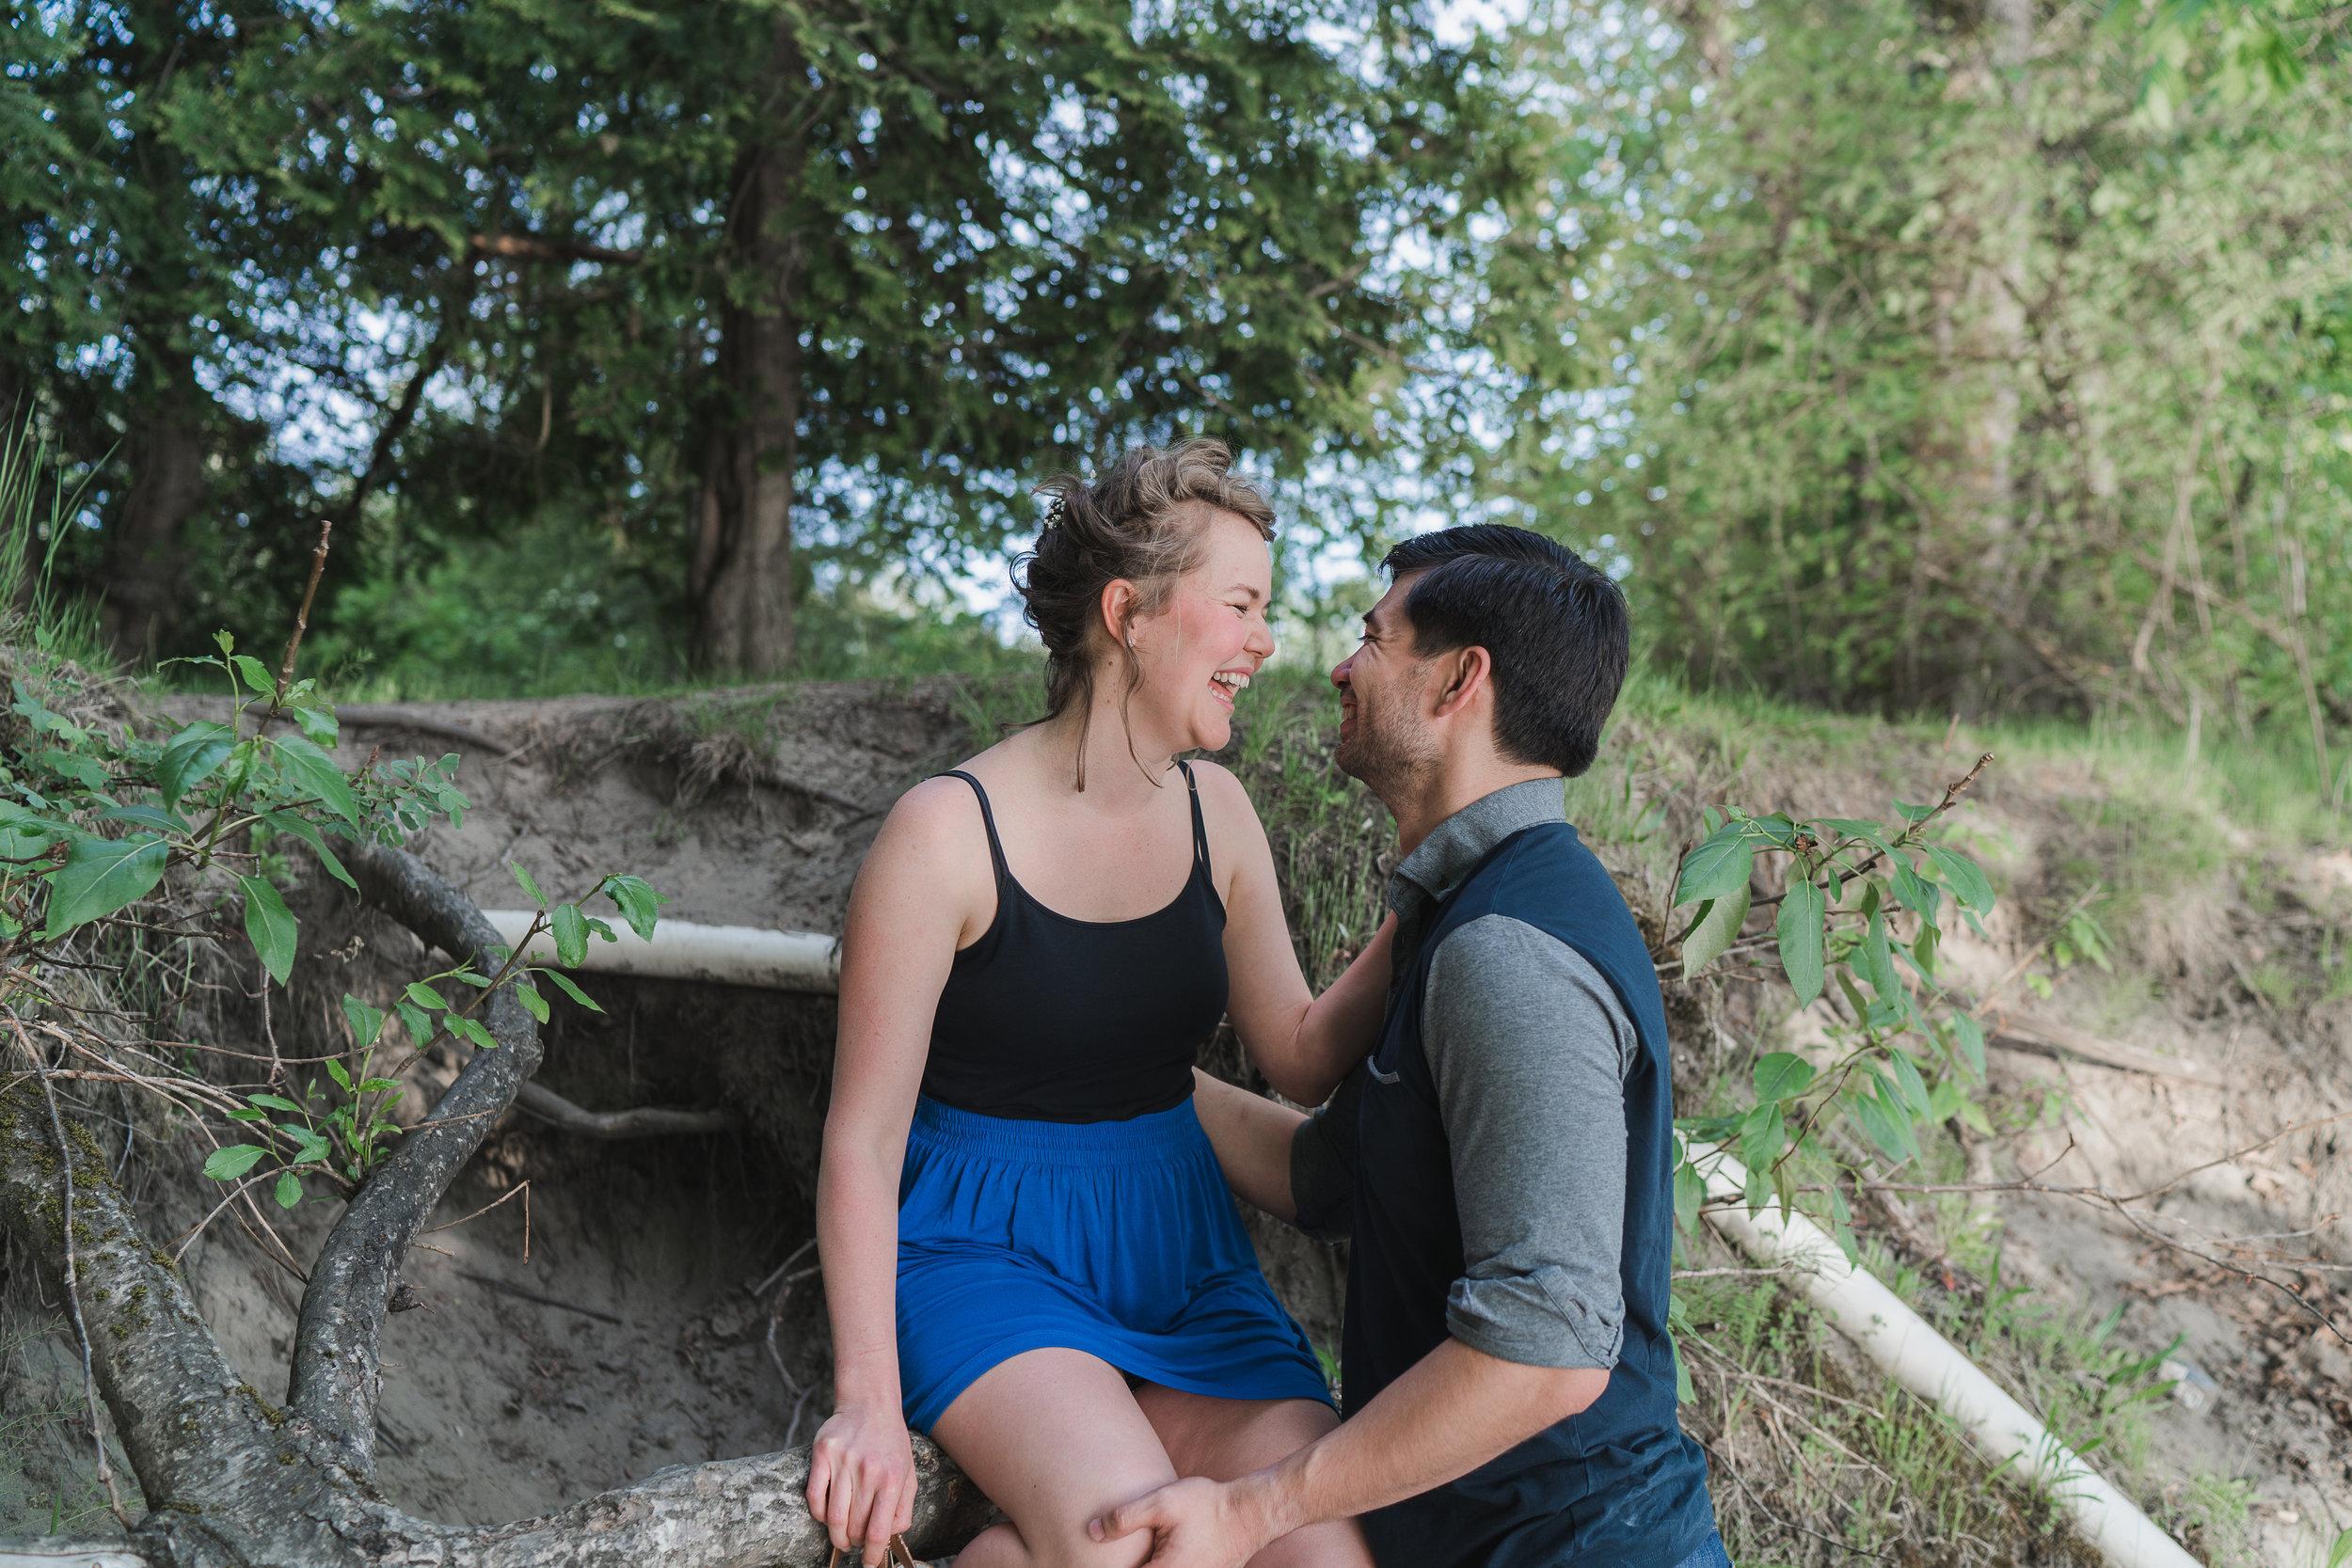 20190511 - Nicola & James Engagement- 0115.jpg